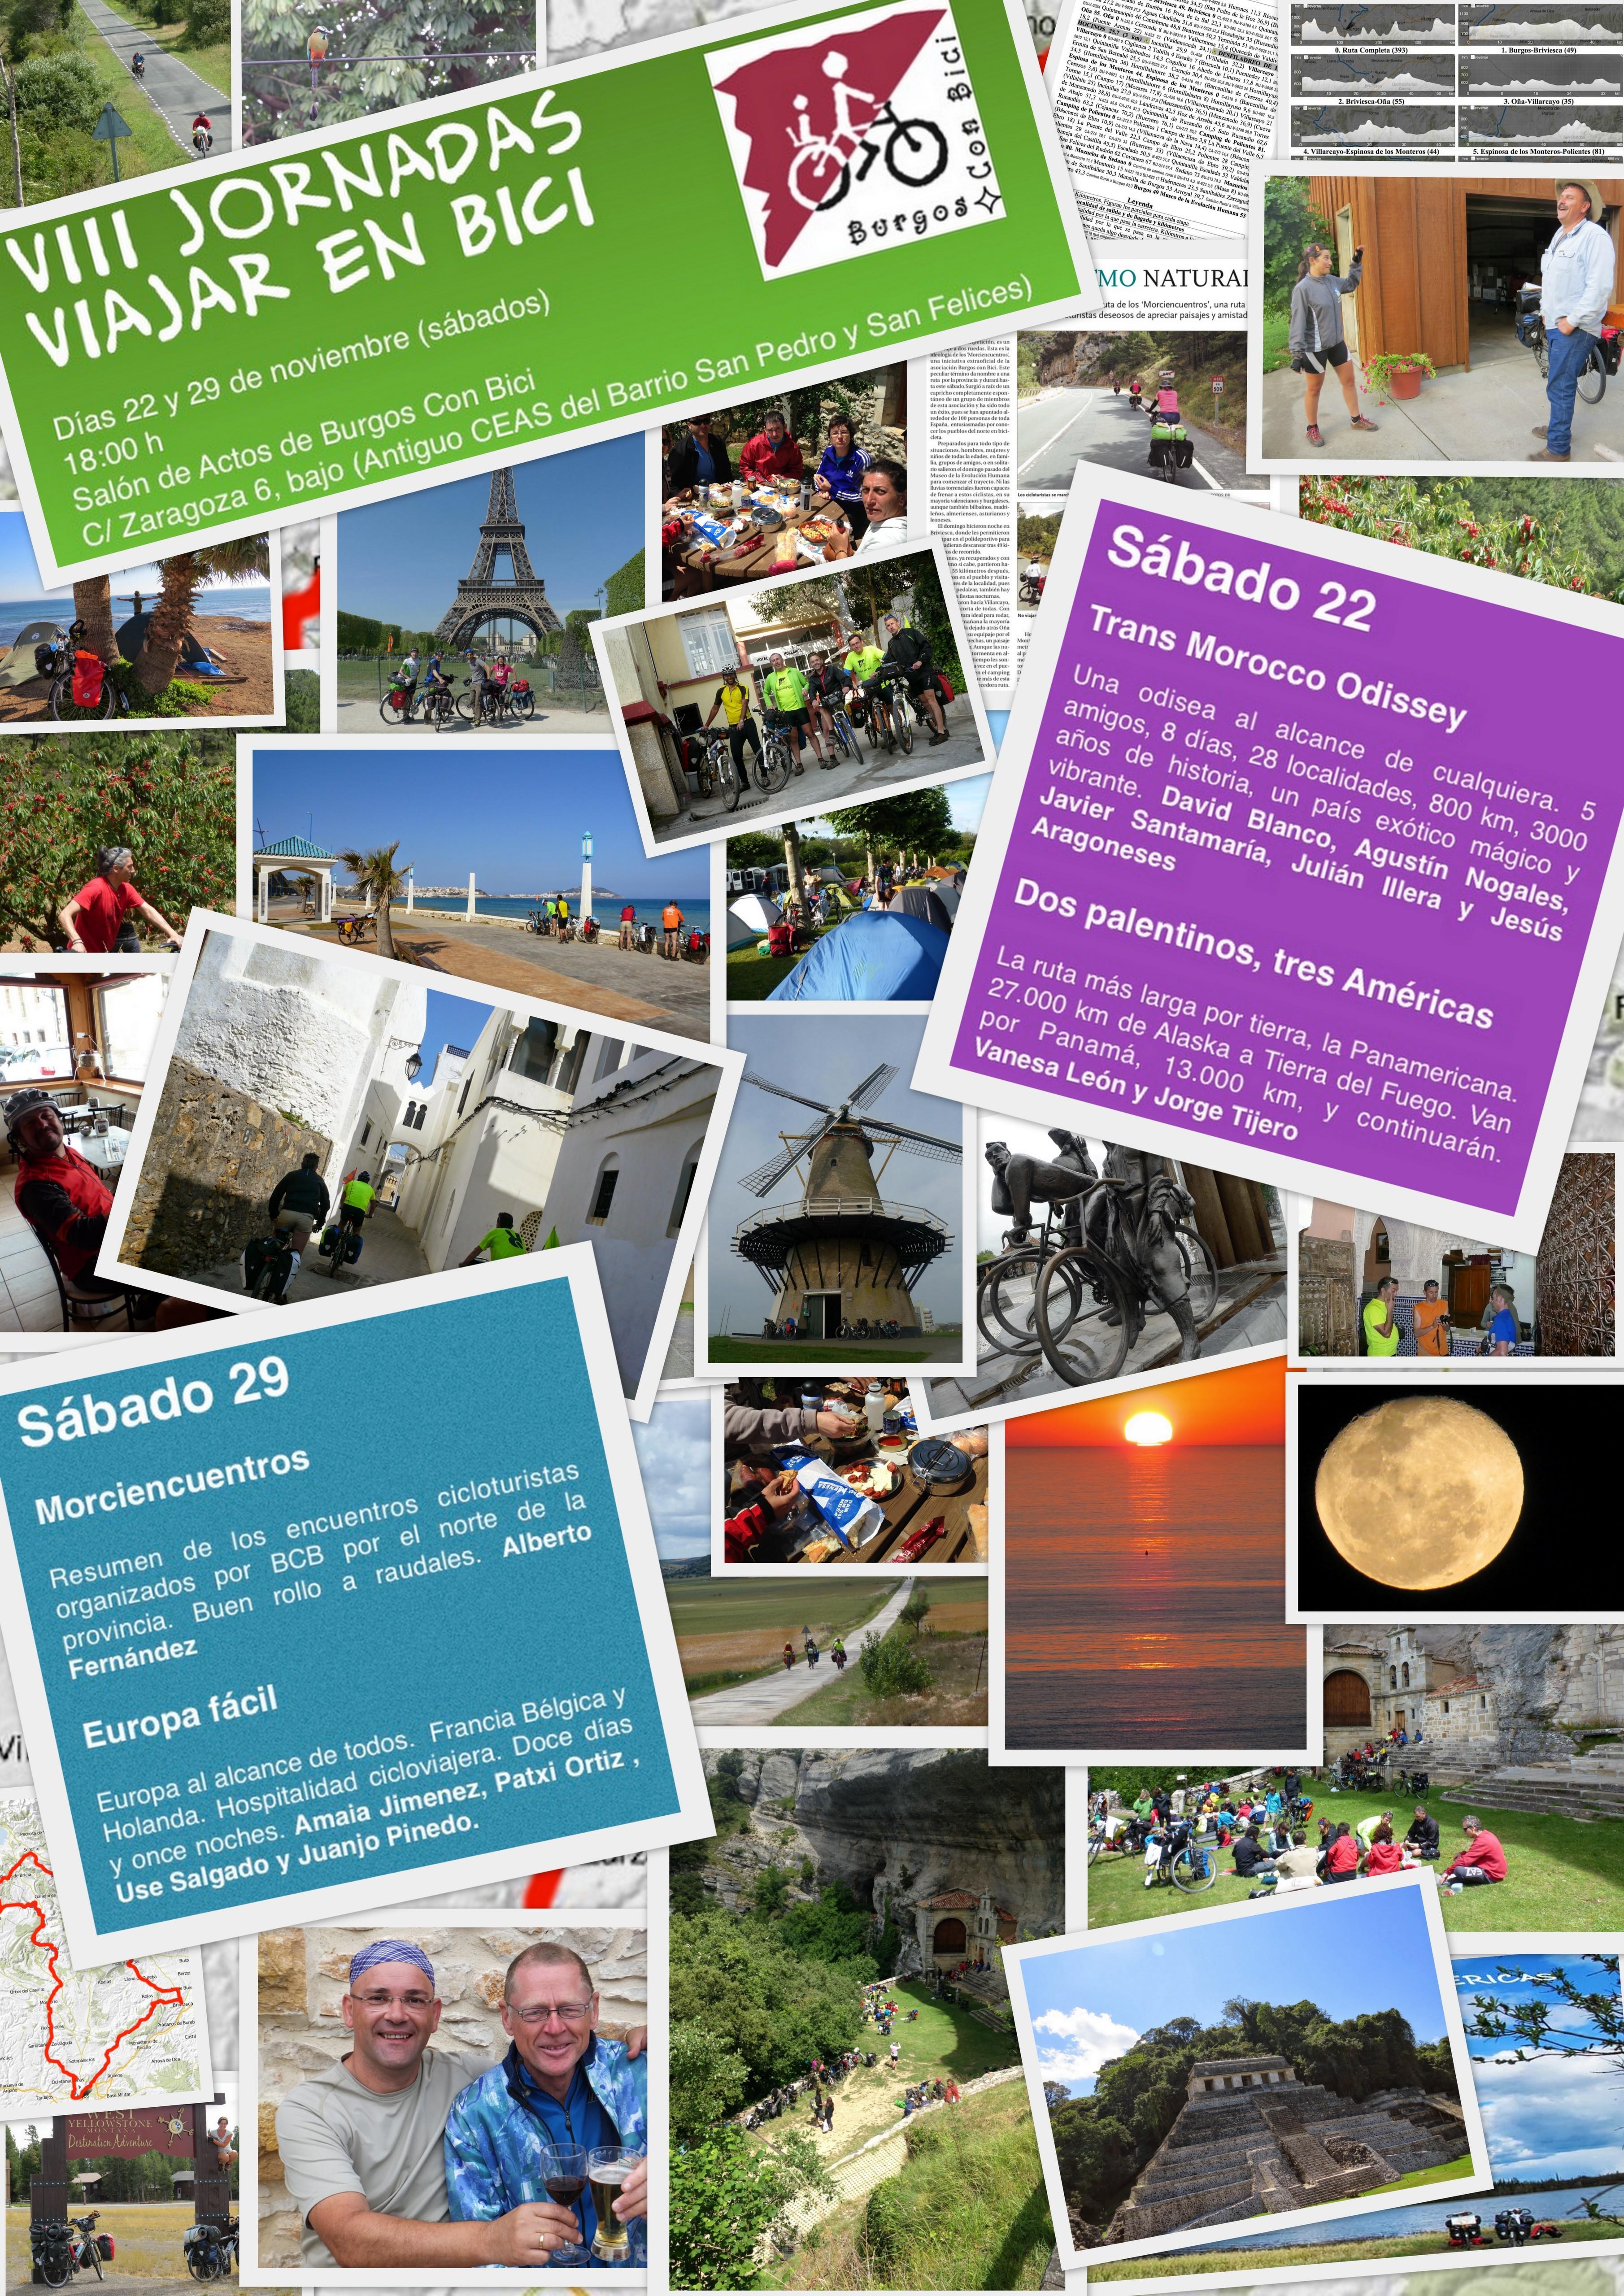 Cadrtel de las VIII Jornadas Viajar en Bici